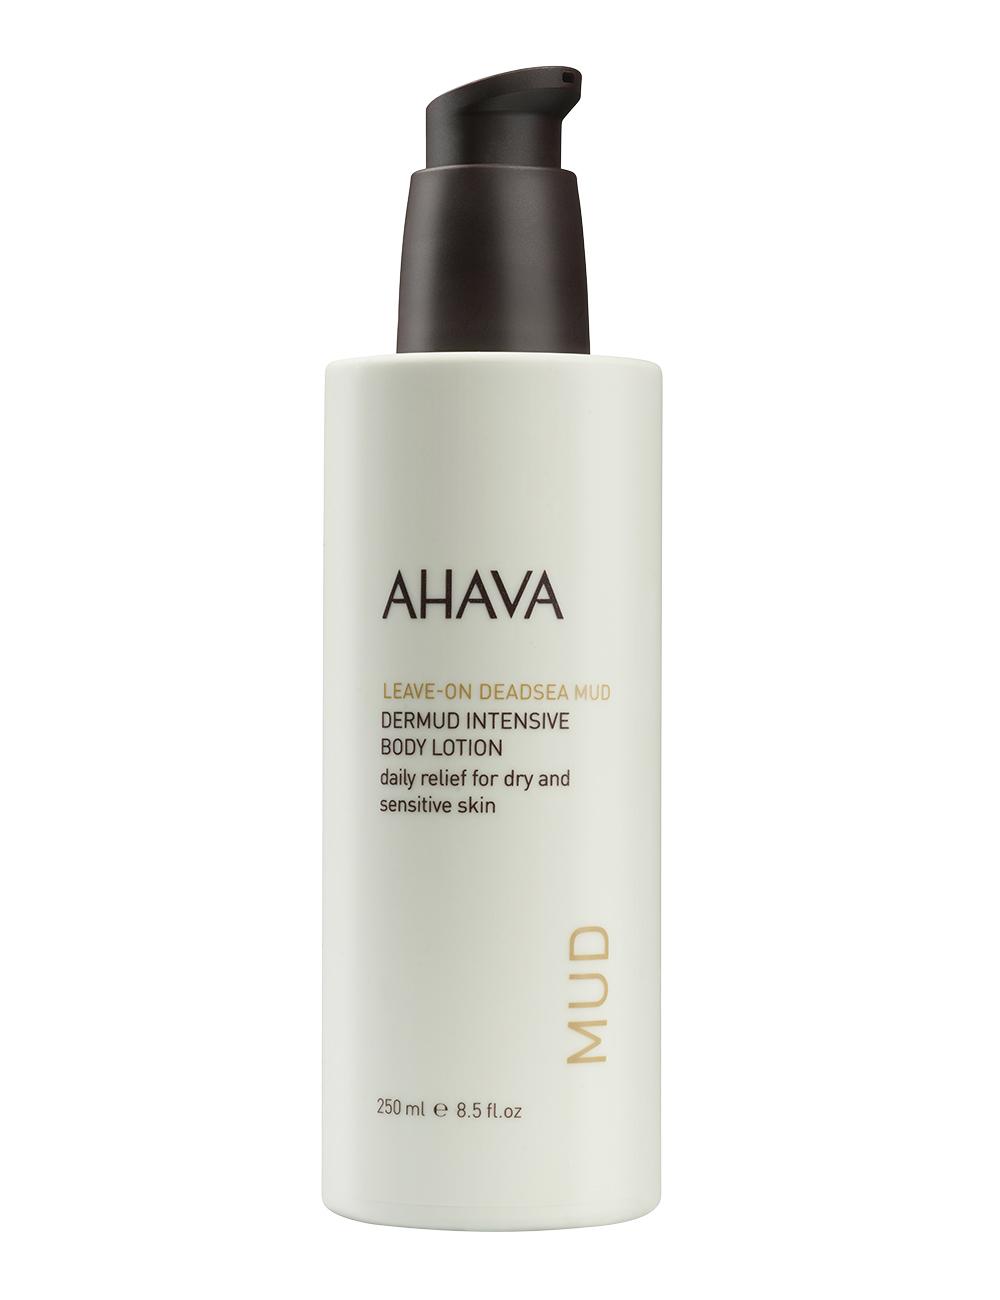 AHAVA - Dermud Intensive Body Lotion 250 ml